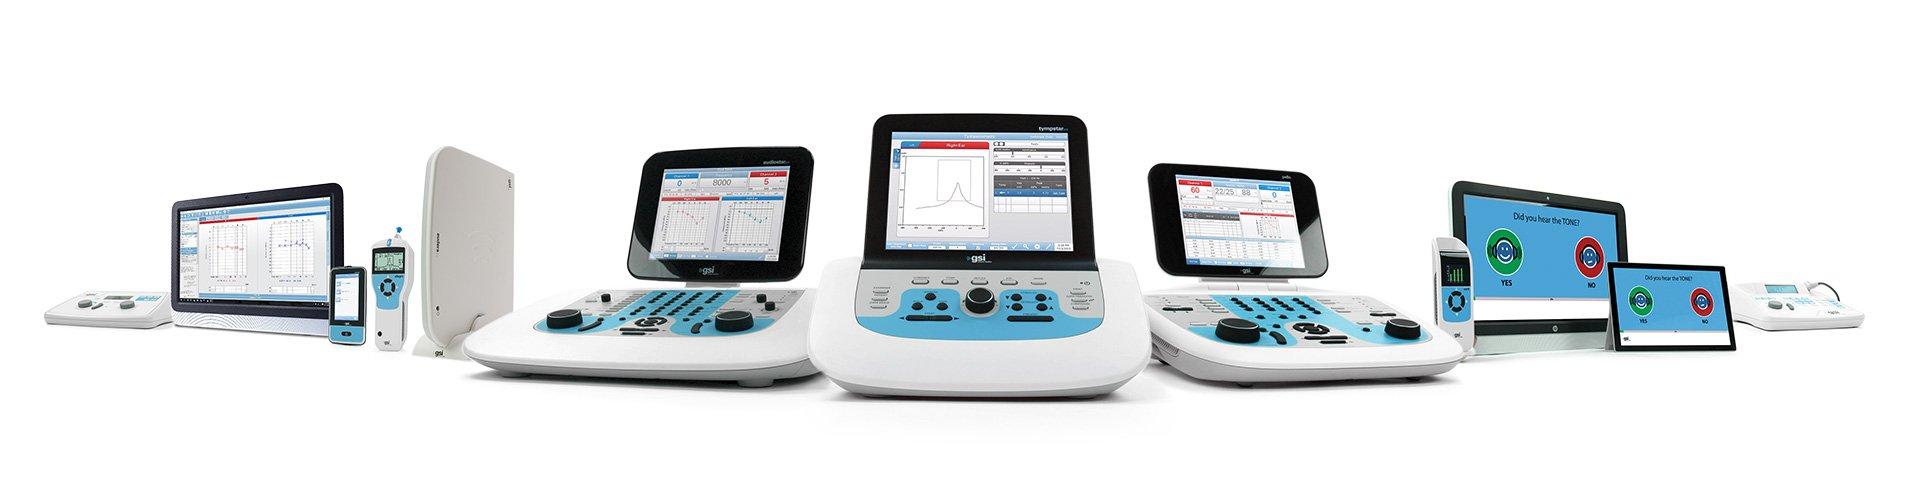 Grason-Stadler audiometric products